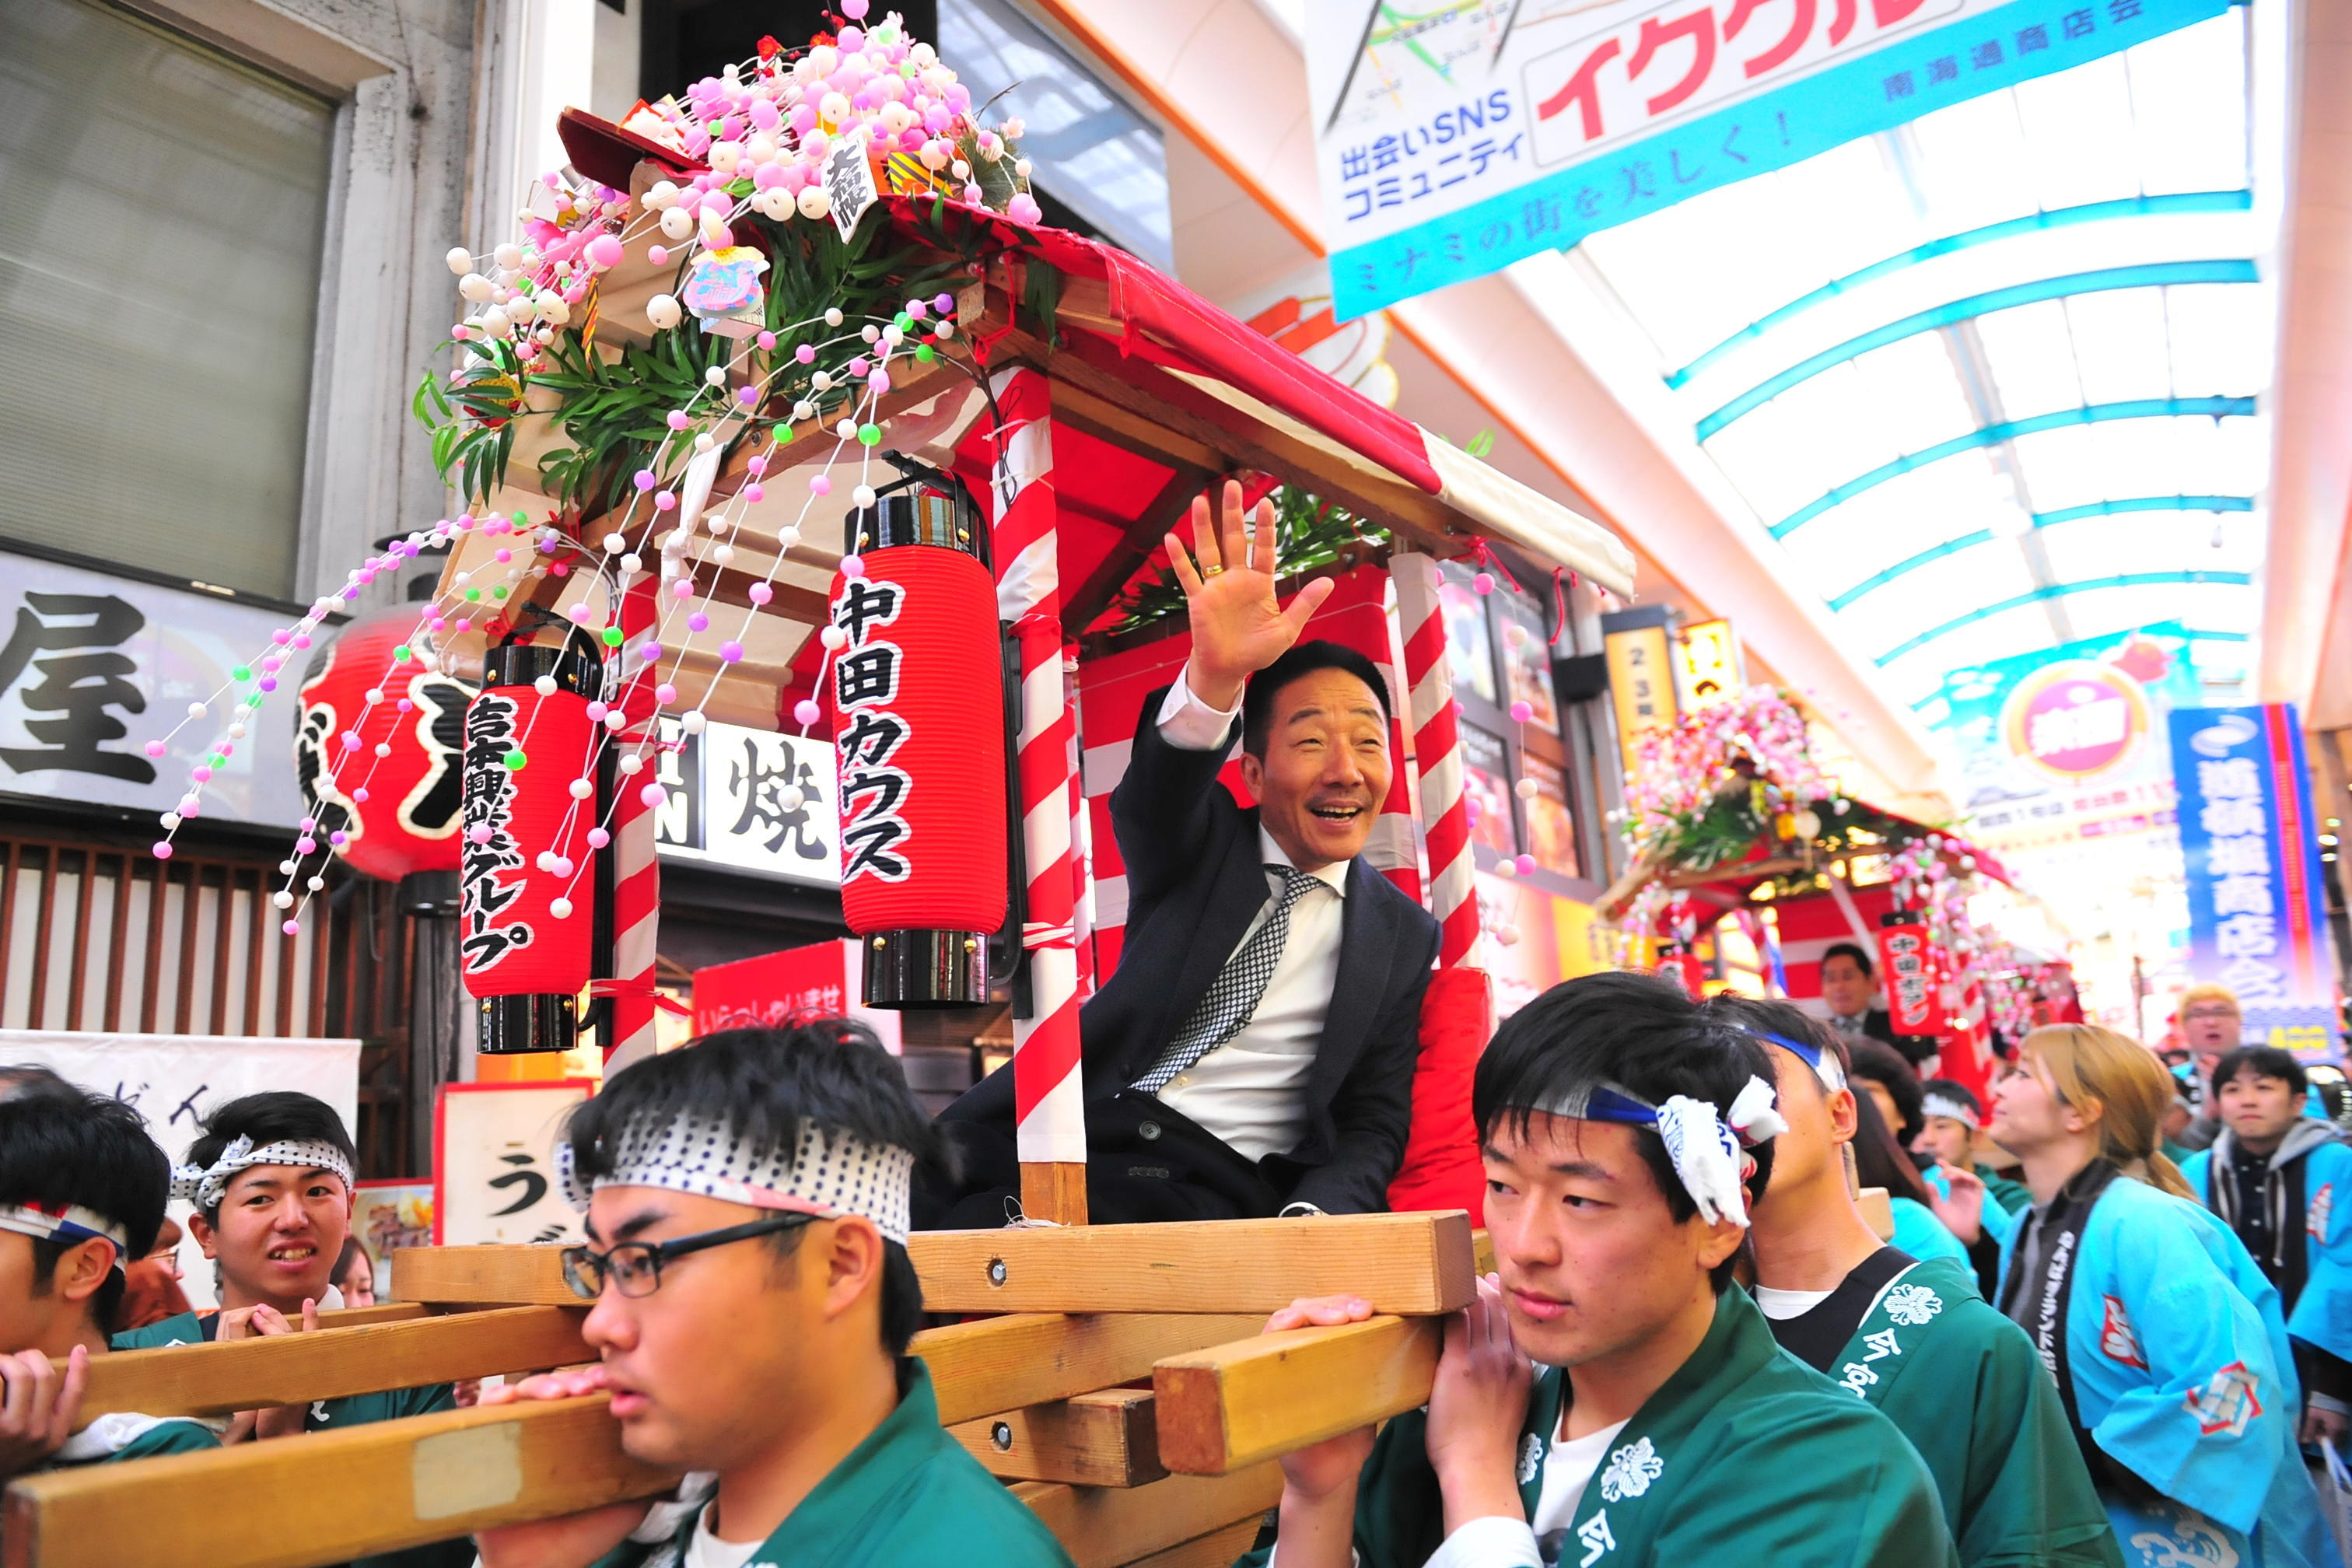 http://news.yoshimoto.co.jp/20170110170559-9264cb244e8fce3c67e46da68402e66df475f6a0.jpg